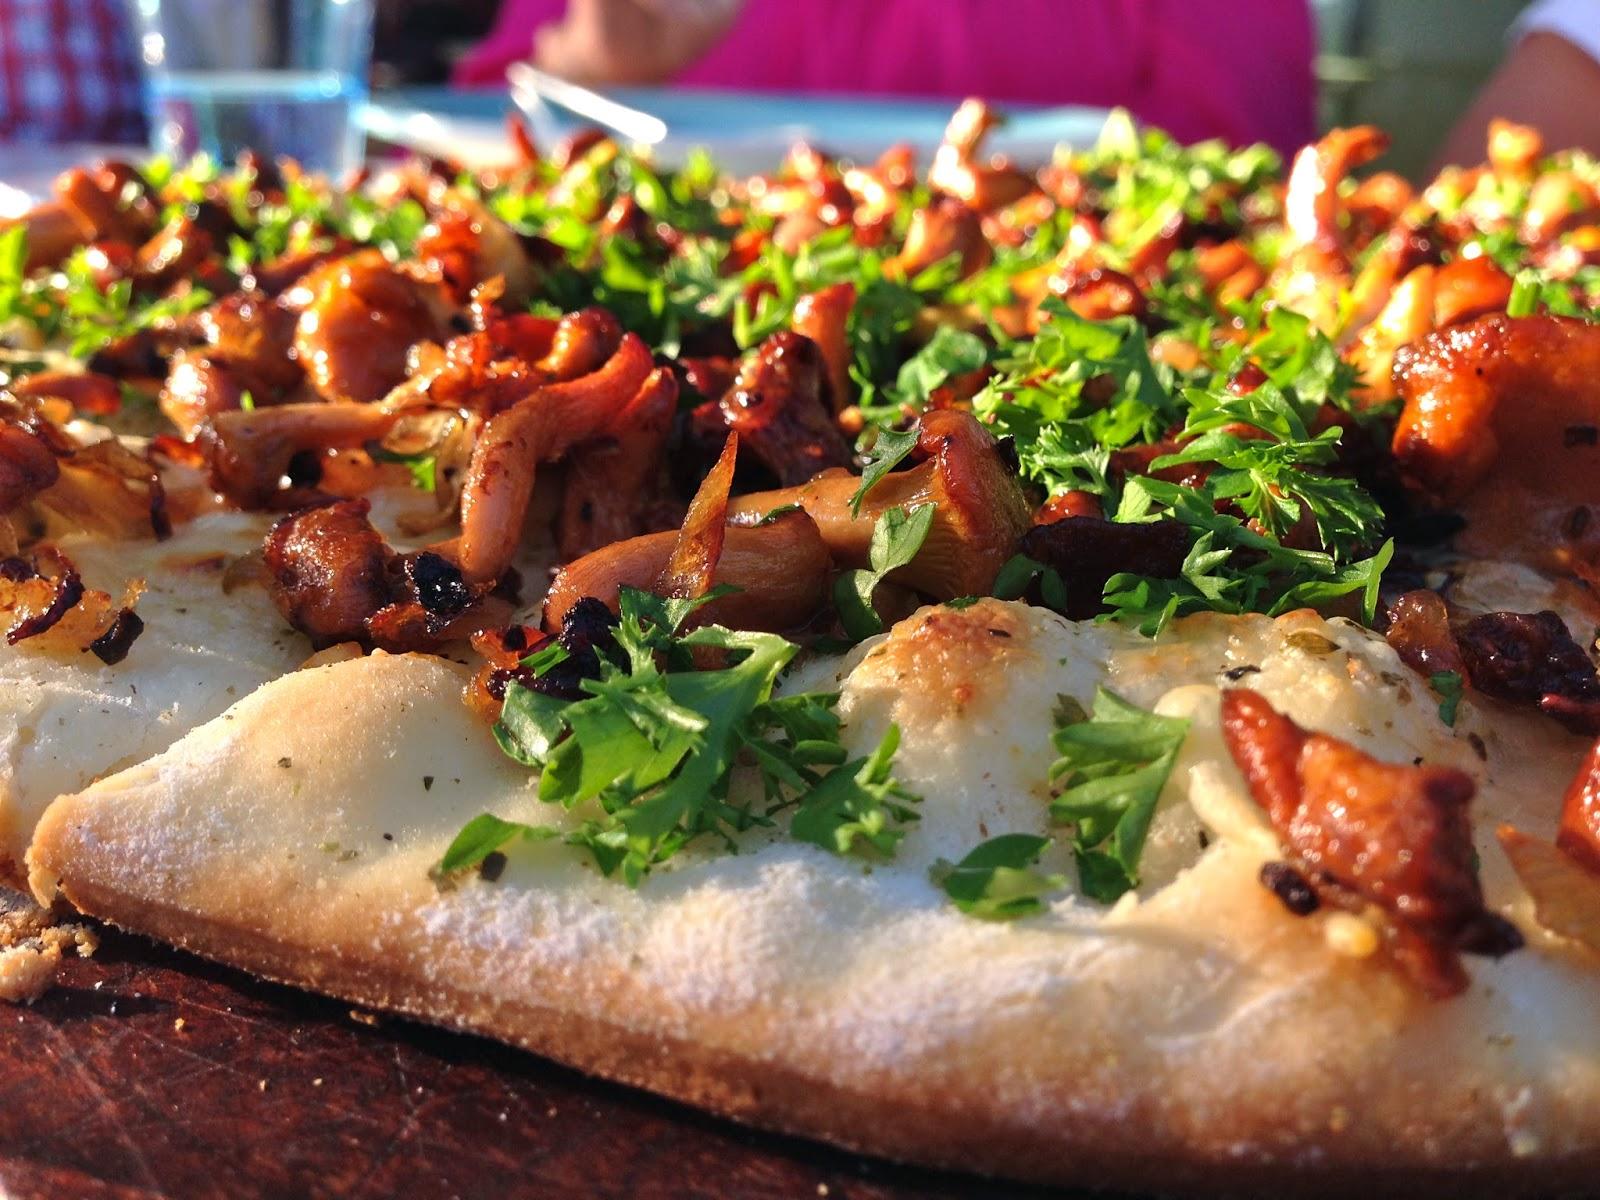 Paradismaten Pizzasten till grillen